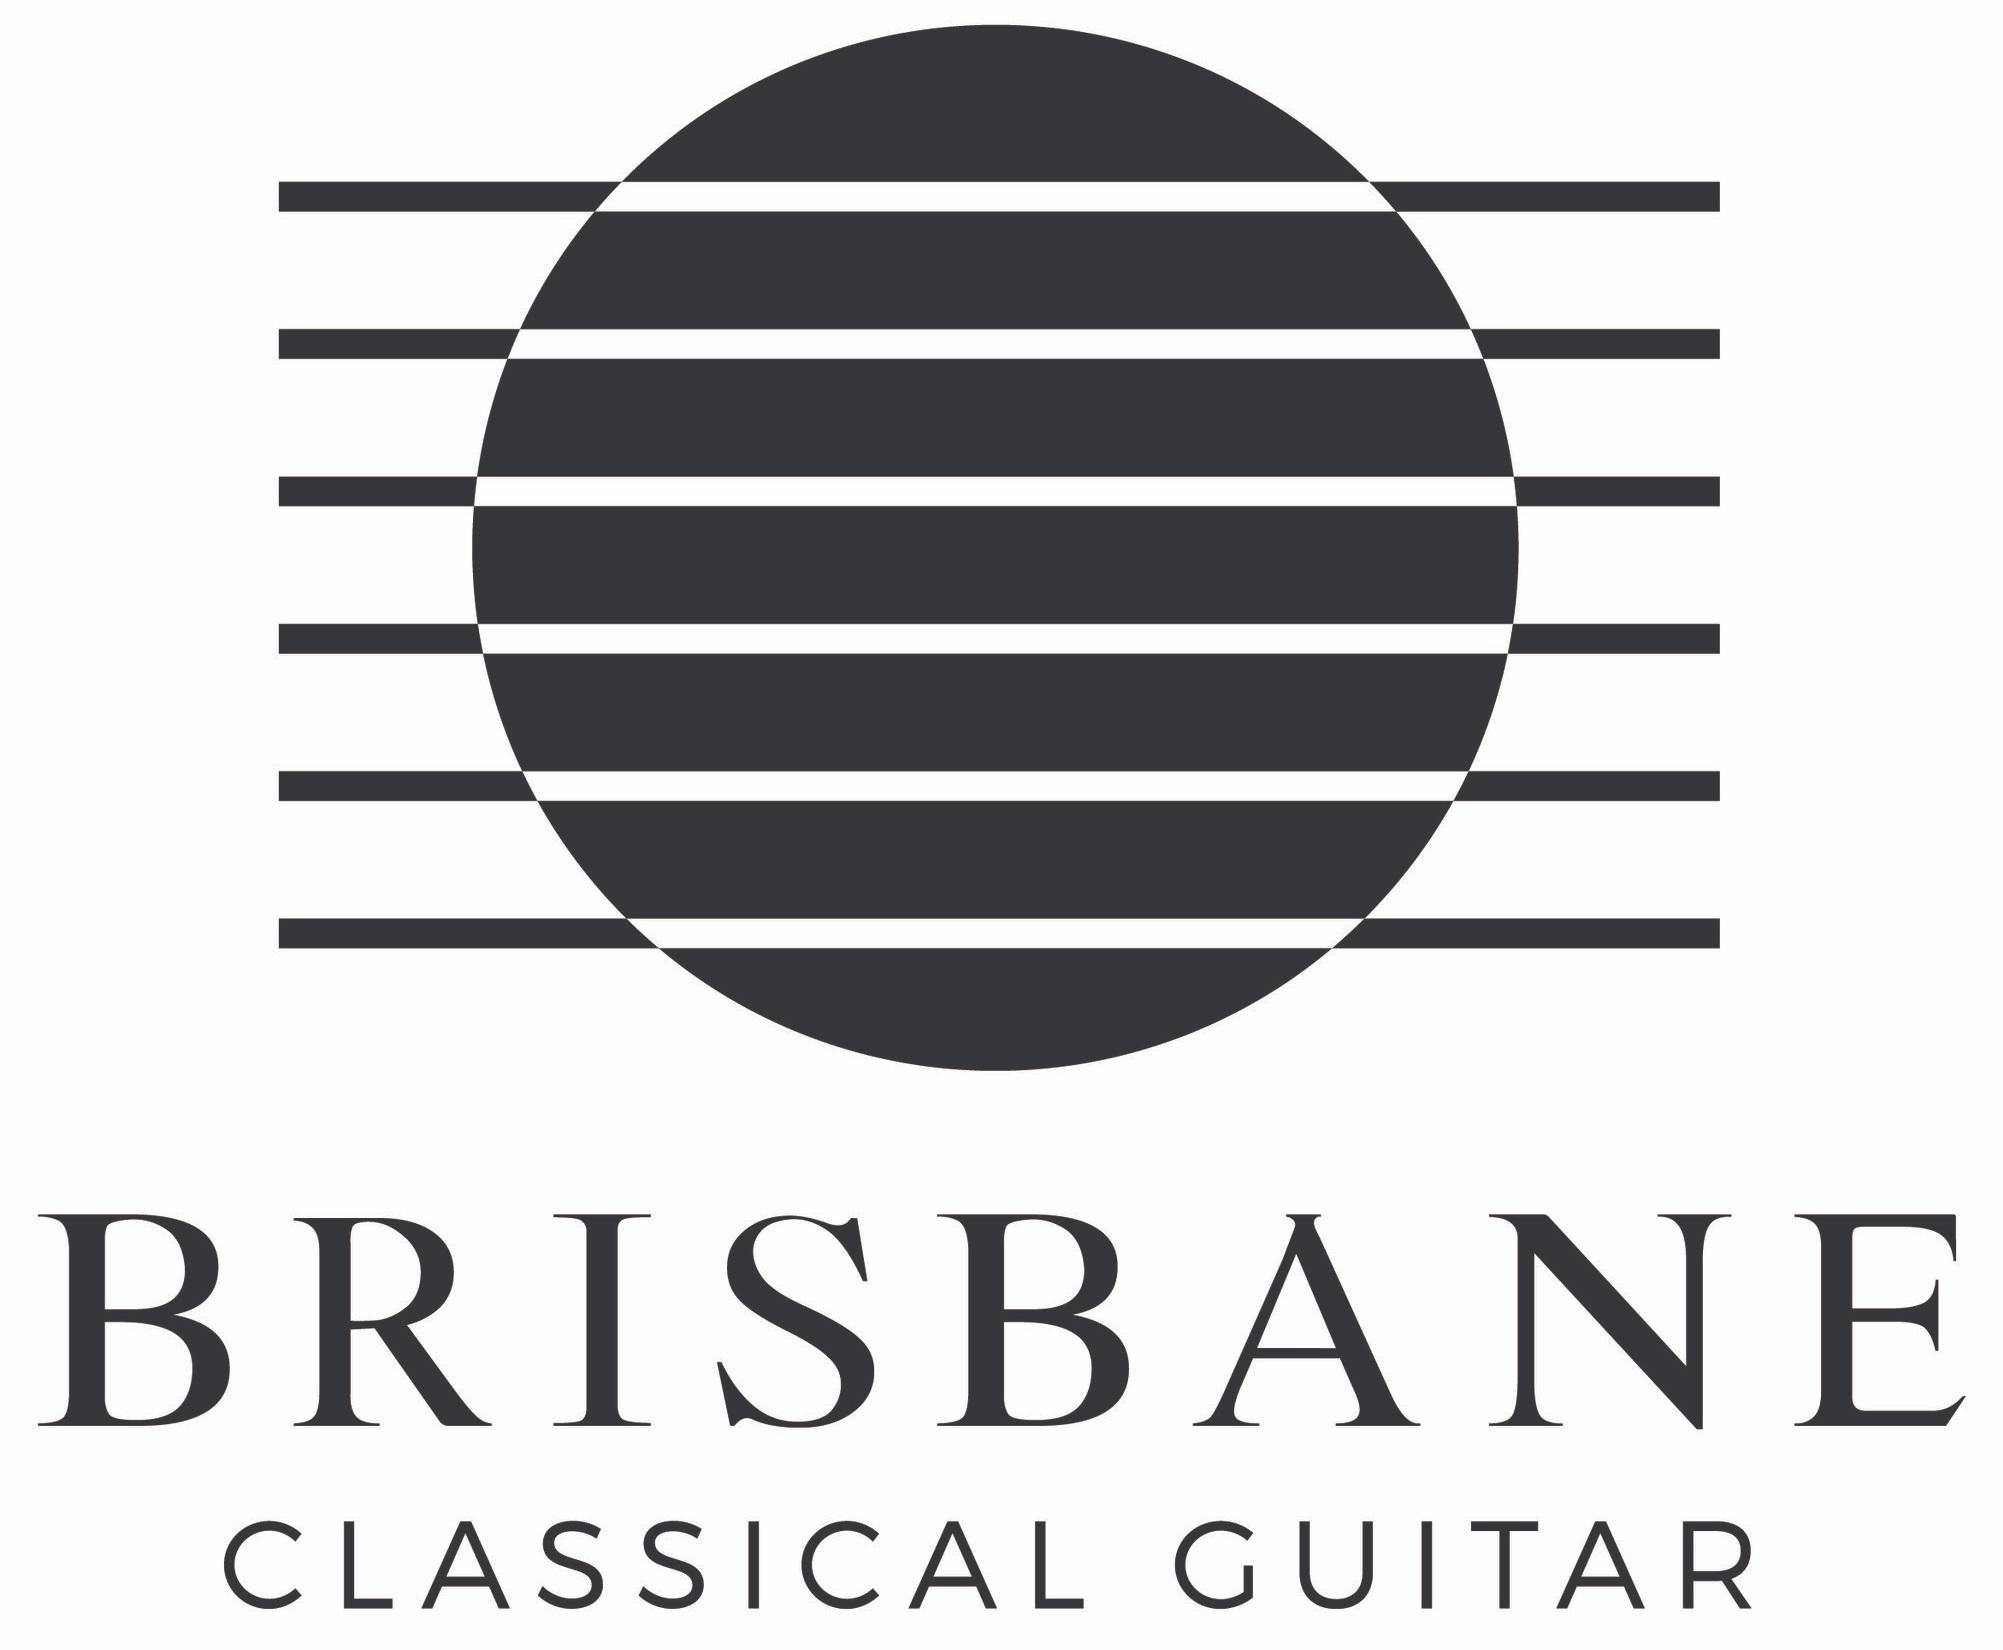 Brisbane+Classical+Guitar.jpg